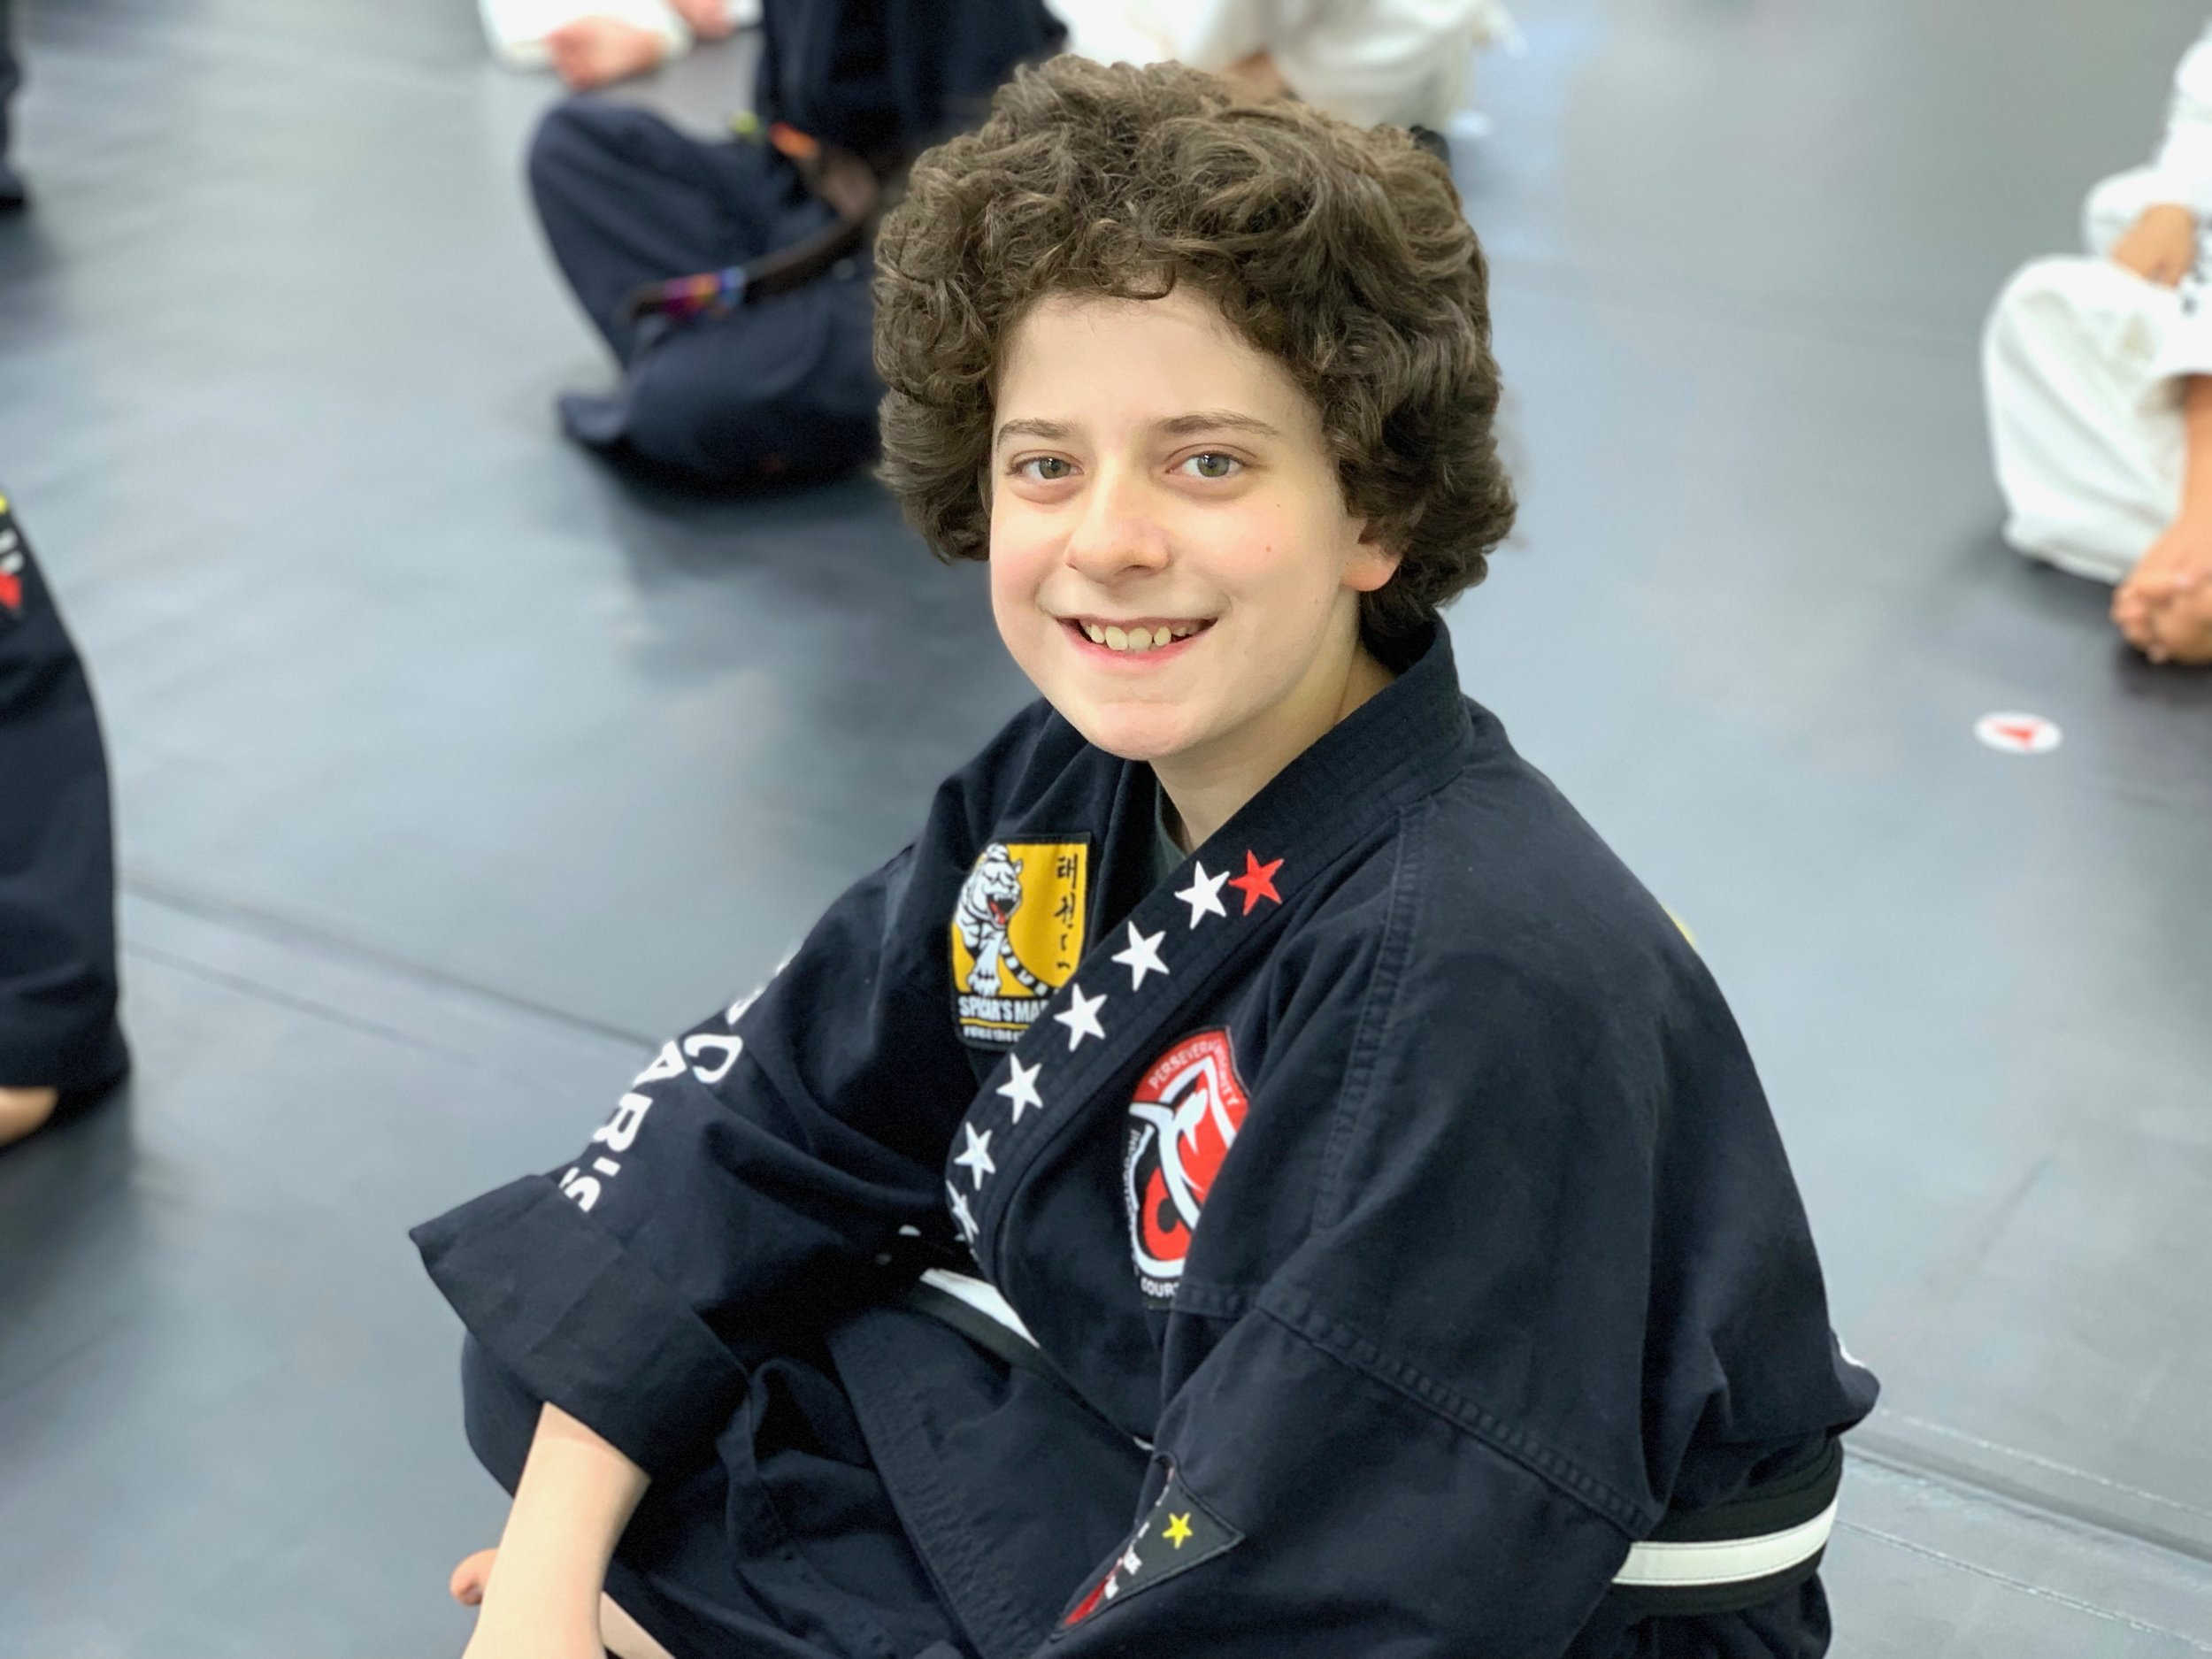 karate-kids-program-souhtlake-keller-grapevine-texas00040.jpeg